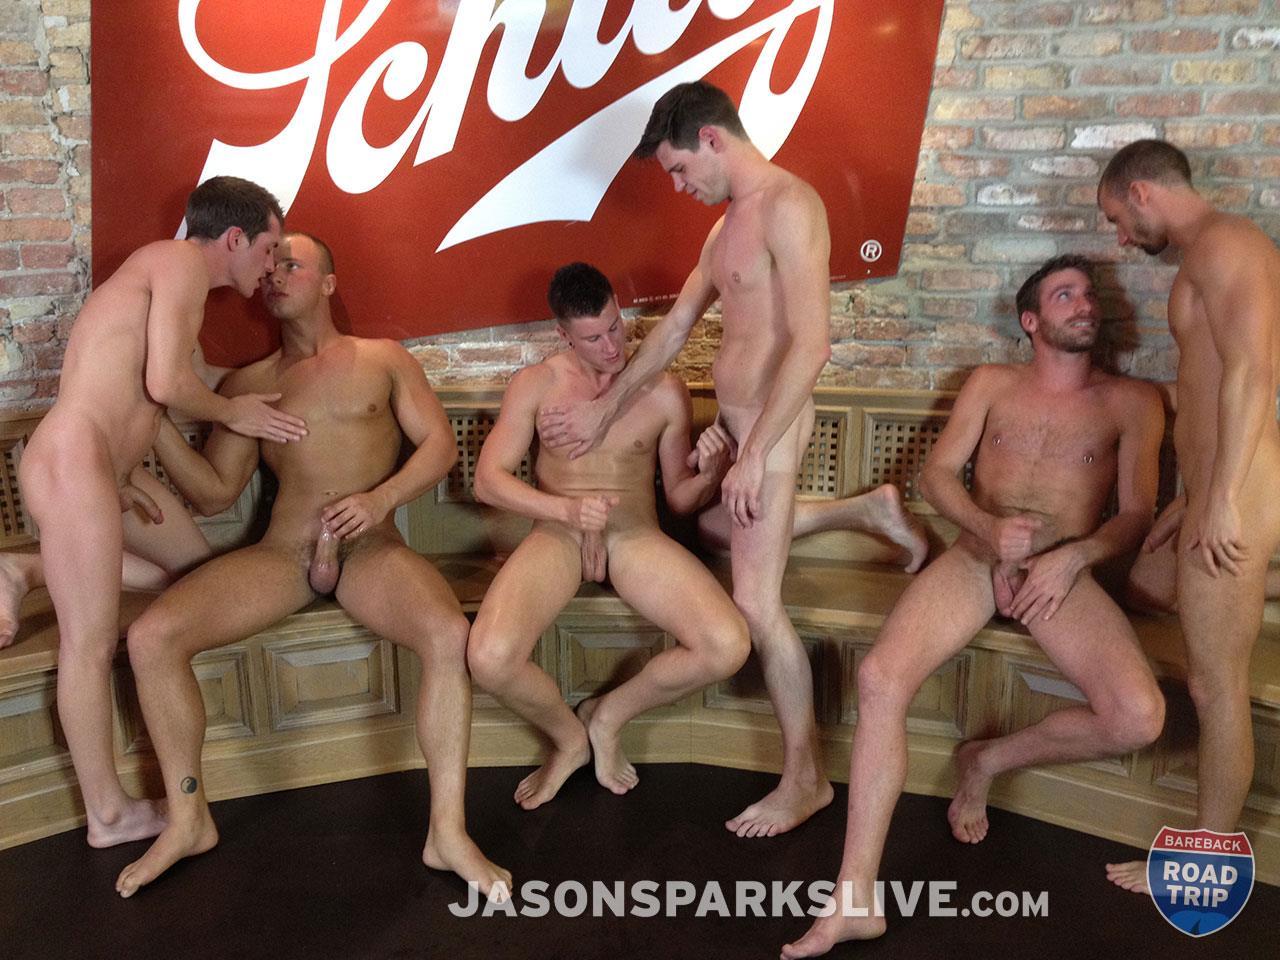 Jason-Sparks-Live-Dustin-Tyler-Shawn-Andrews-Brendon-Scott-Corbin-Riley-Antonio-Paul-Jake-Matthews-Bareback-Orgy-Amateur-Gay-Porn-13 Big Cock Amateur Bareback Orgy in Milwaukee